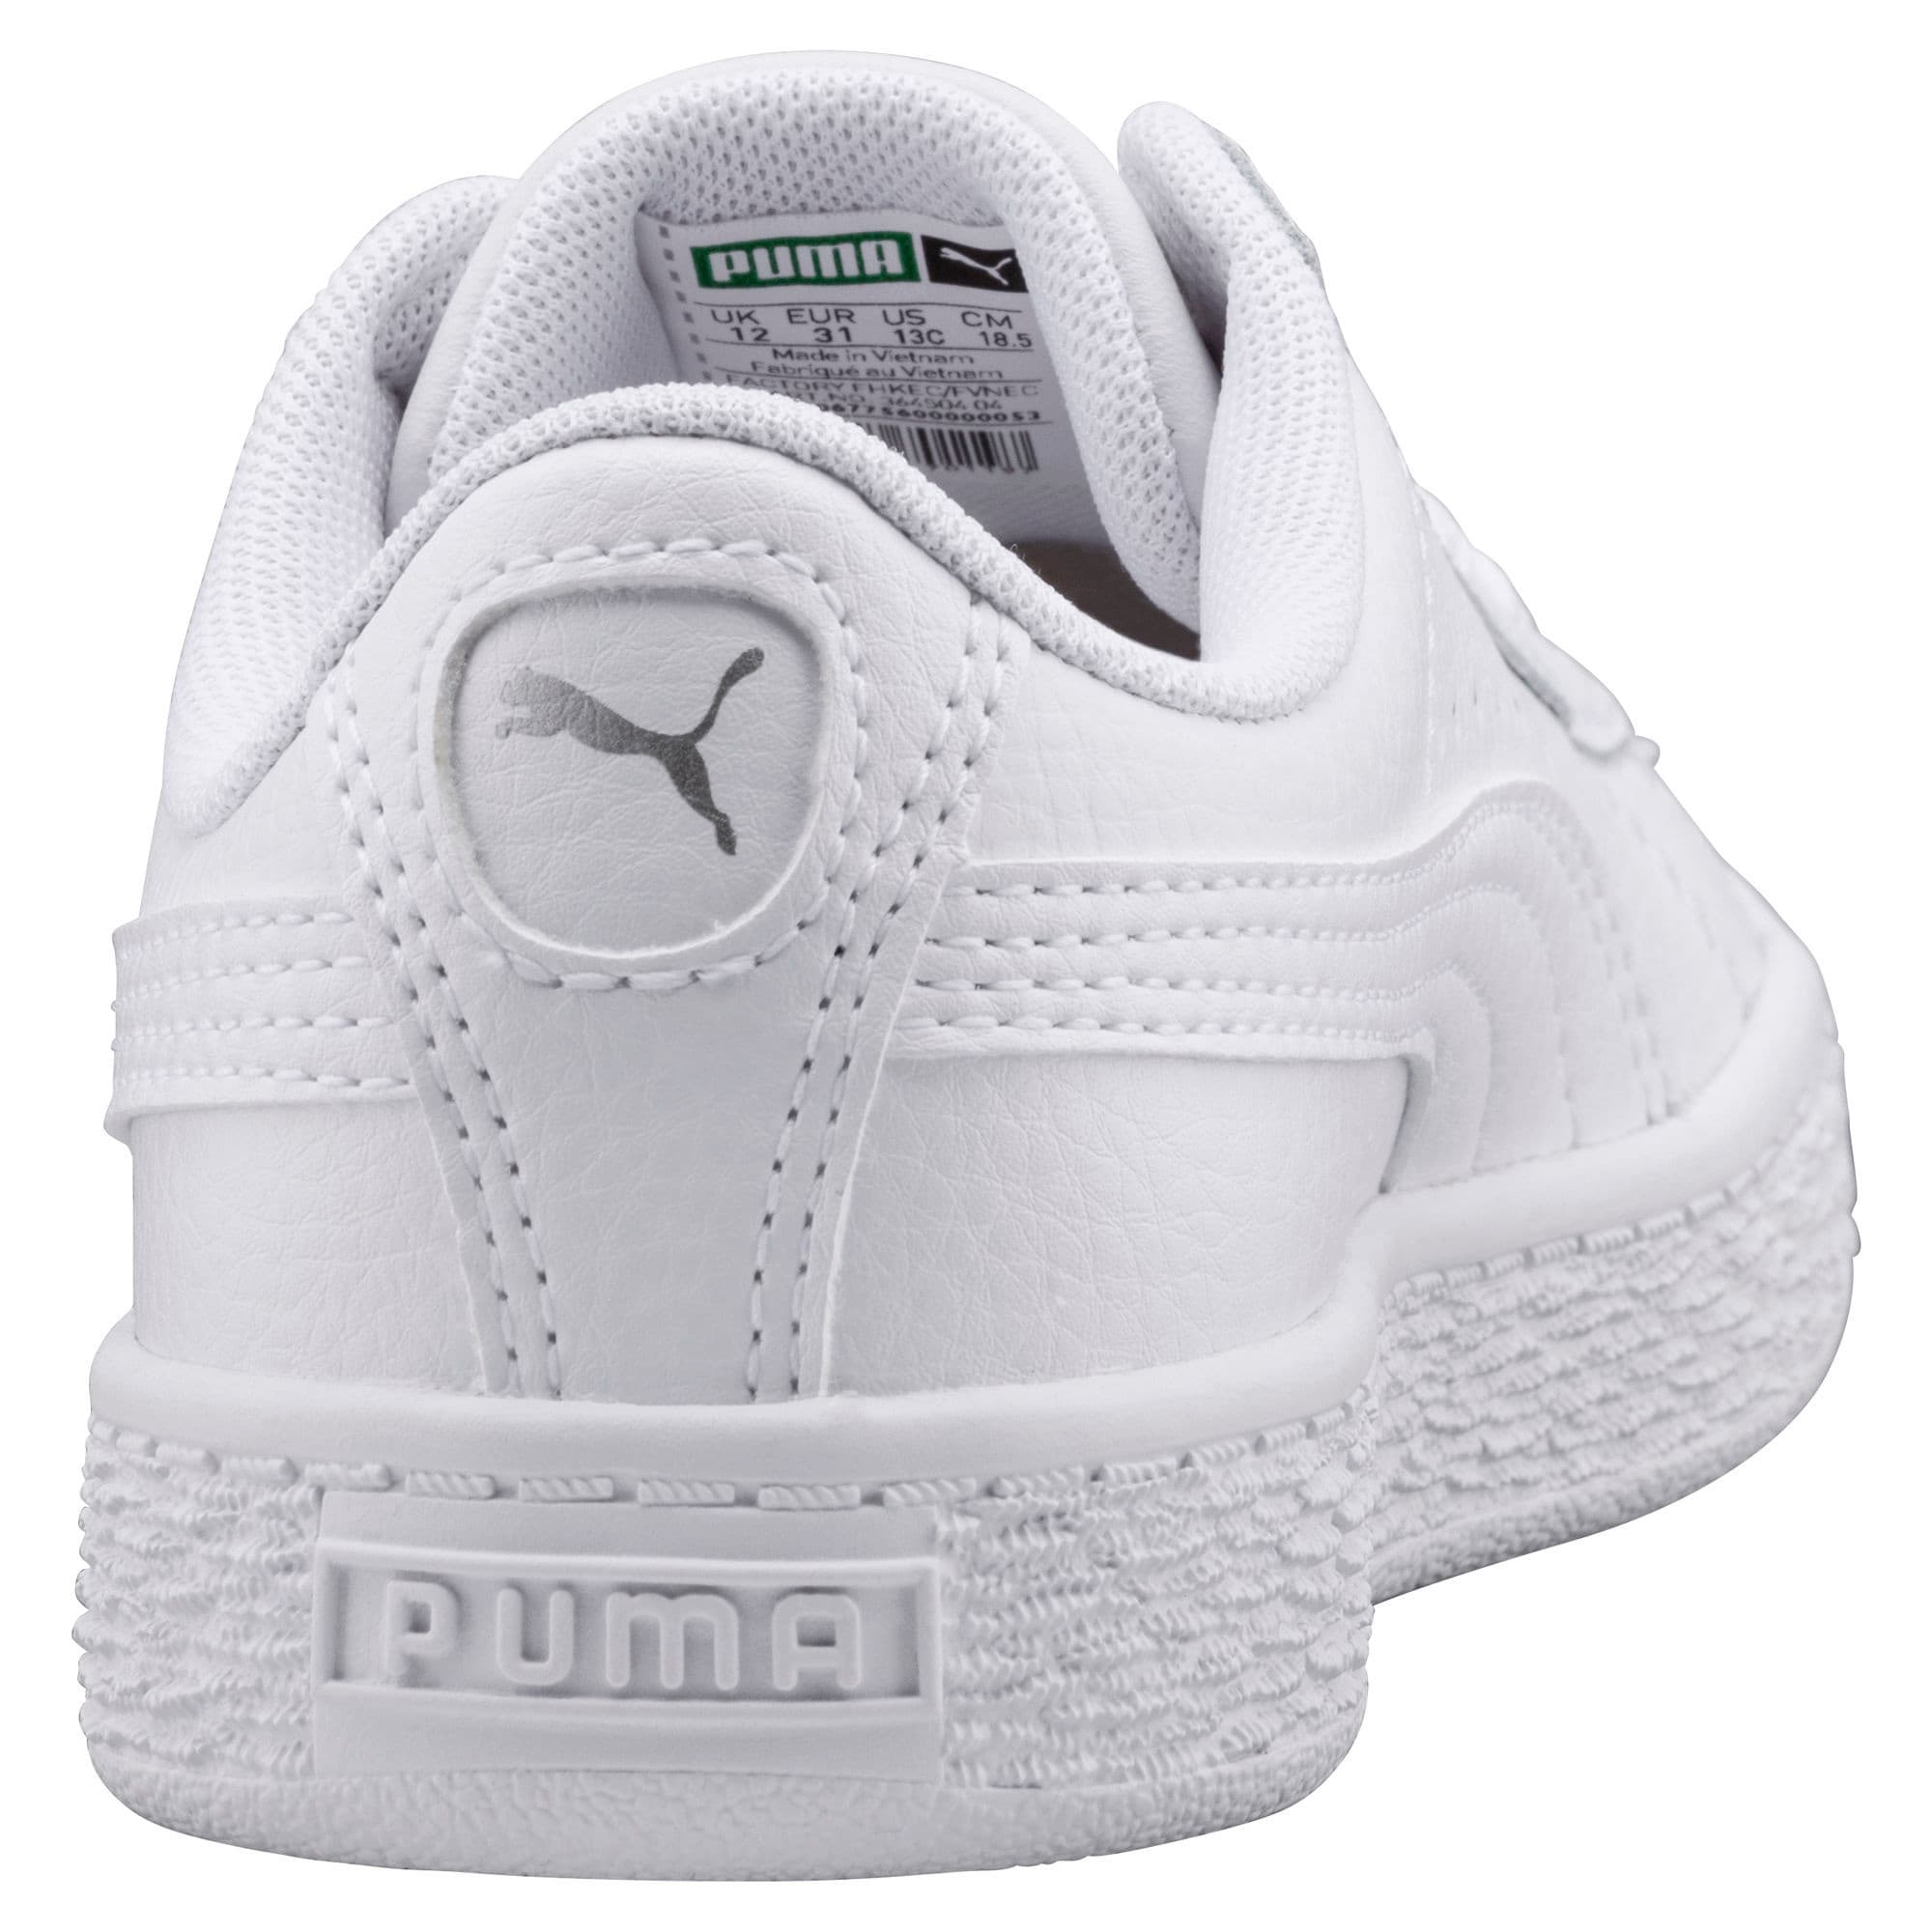 Thumbnail 3 of Basket Classic Sneakers JR, Puma White-Puma White, medium